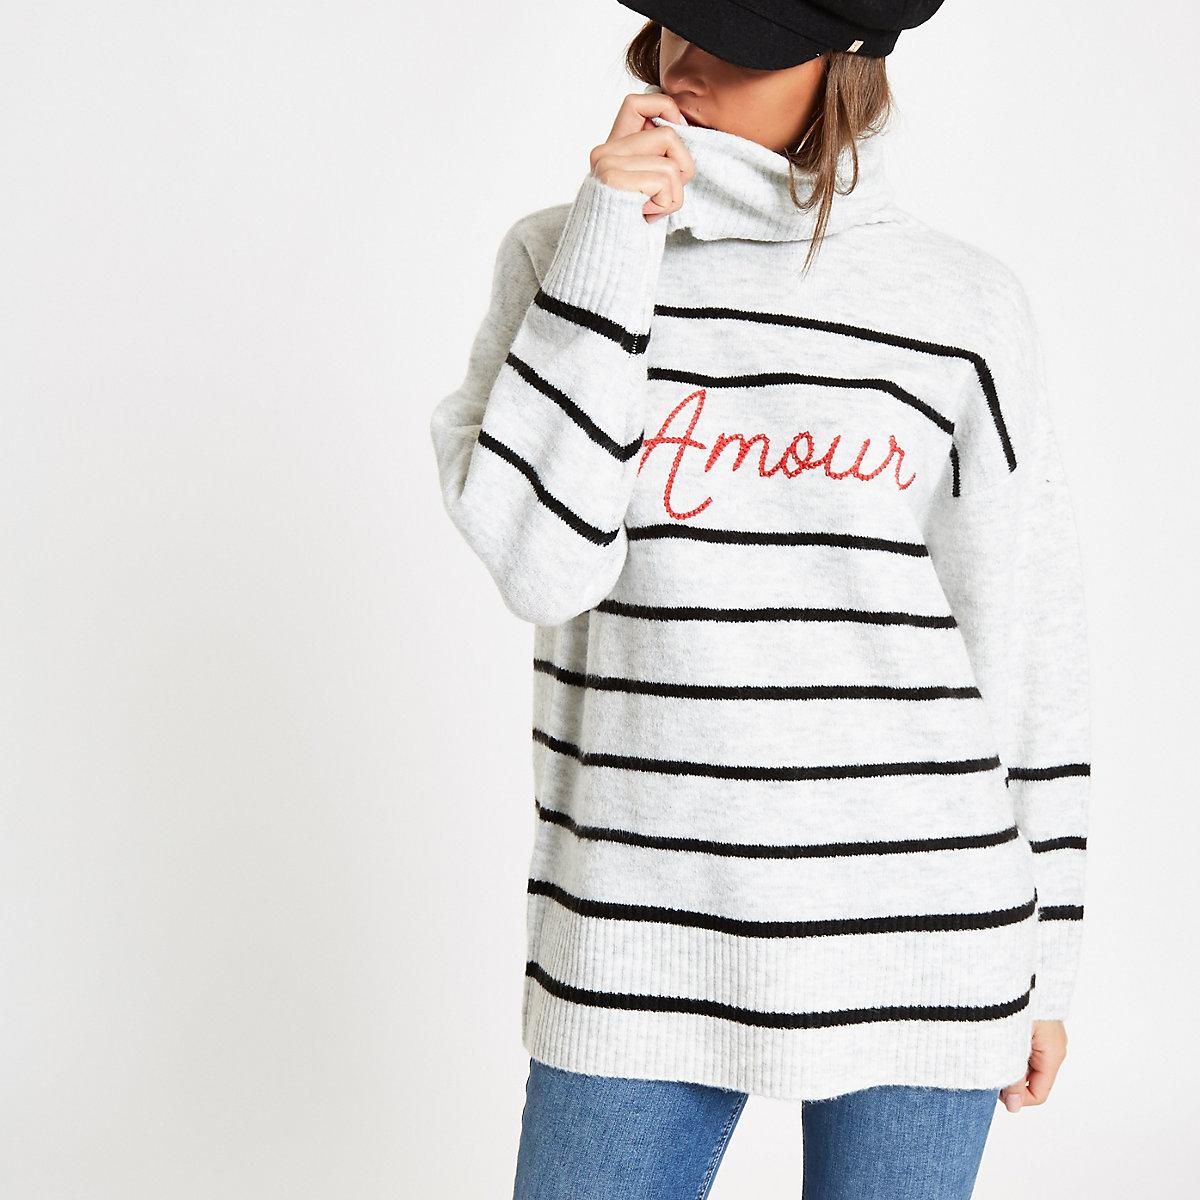 Cream stripe 'Amour' roll neck sweater